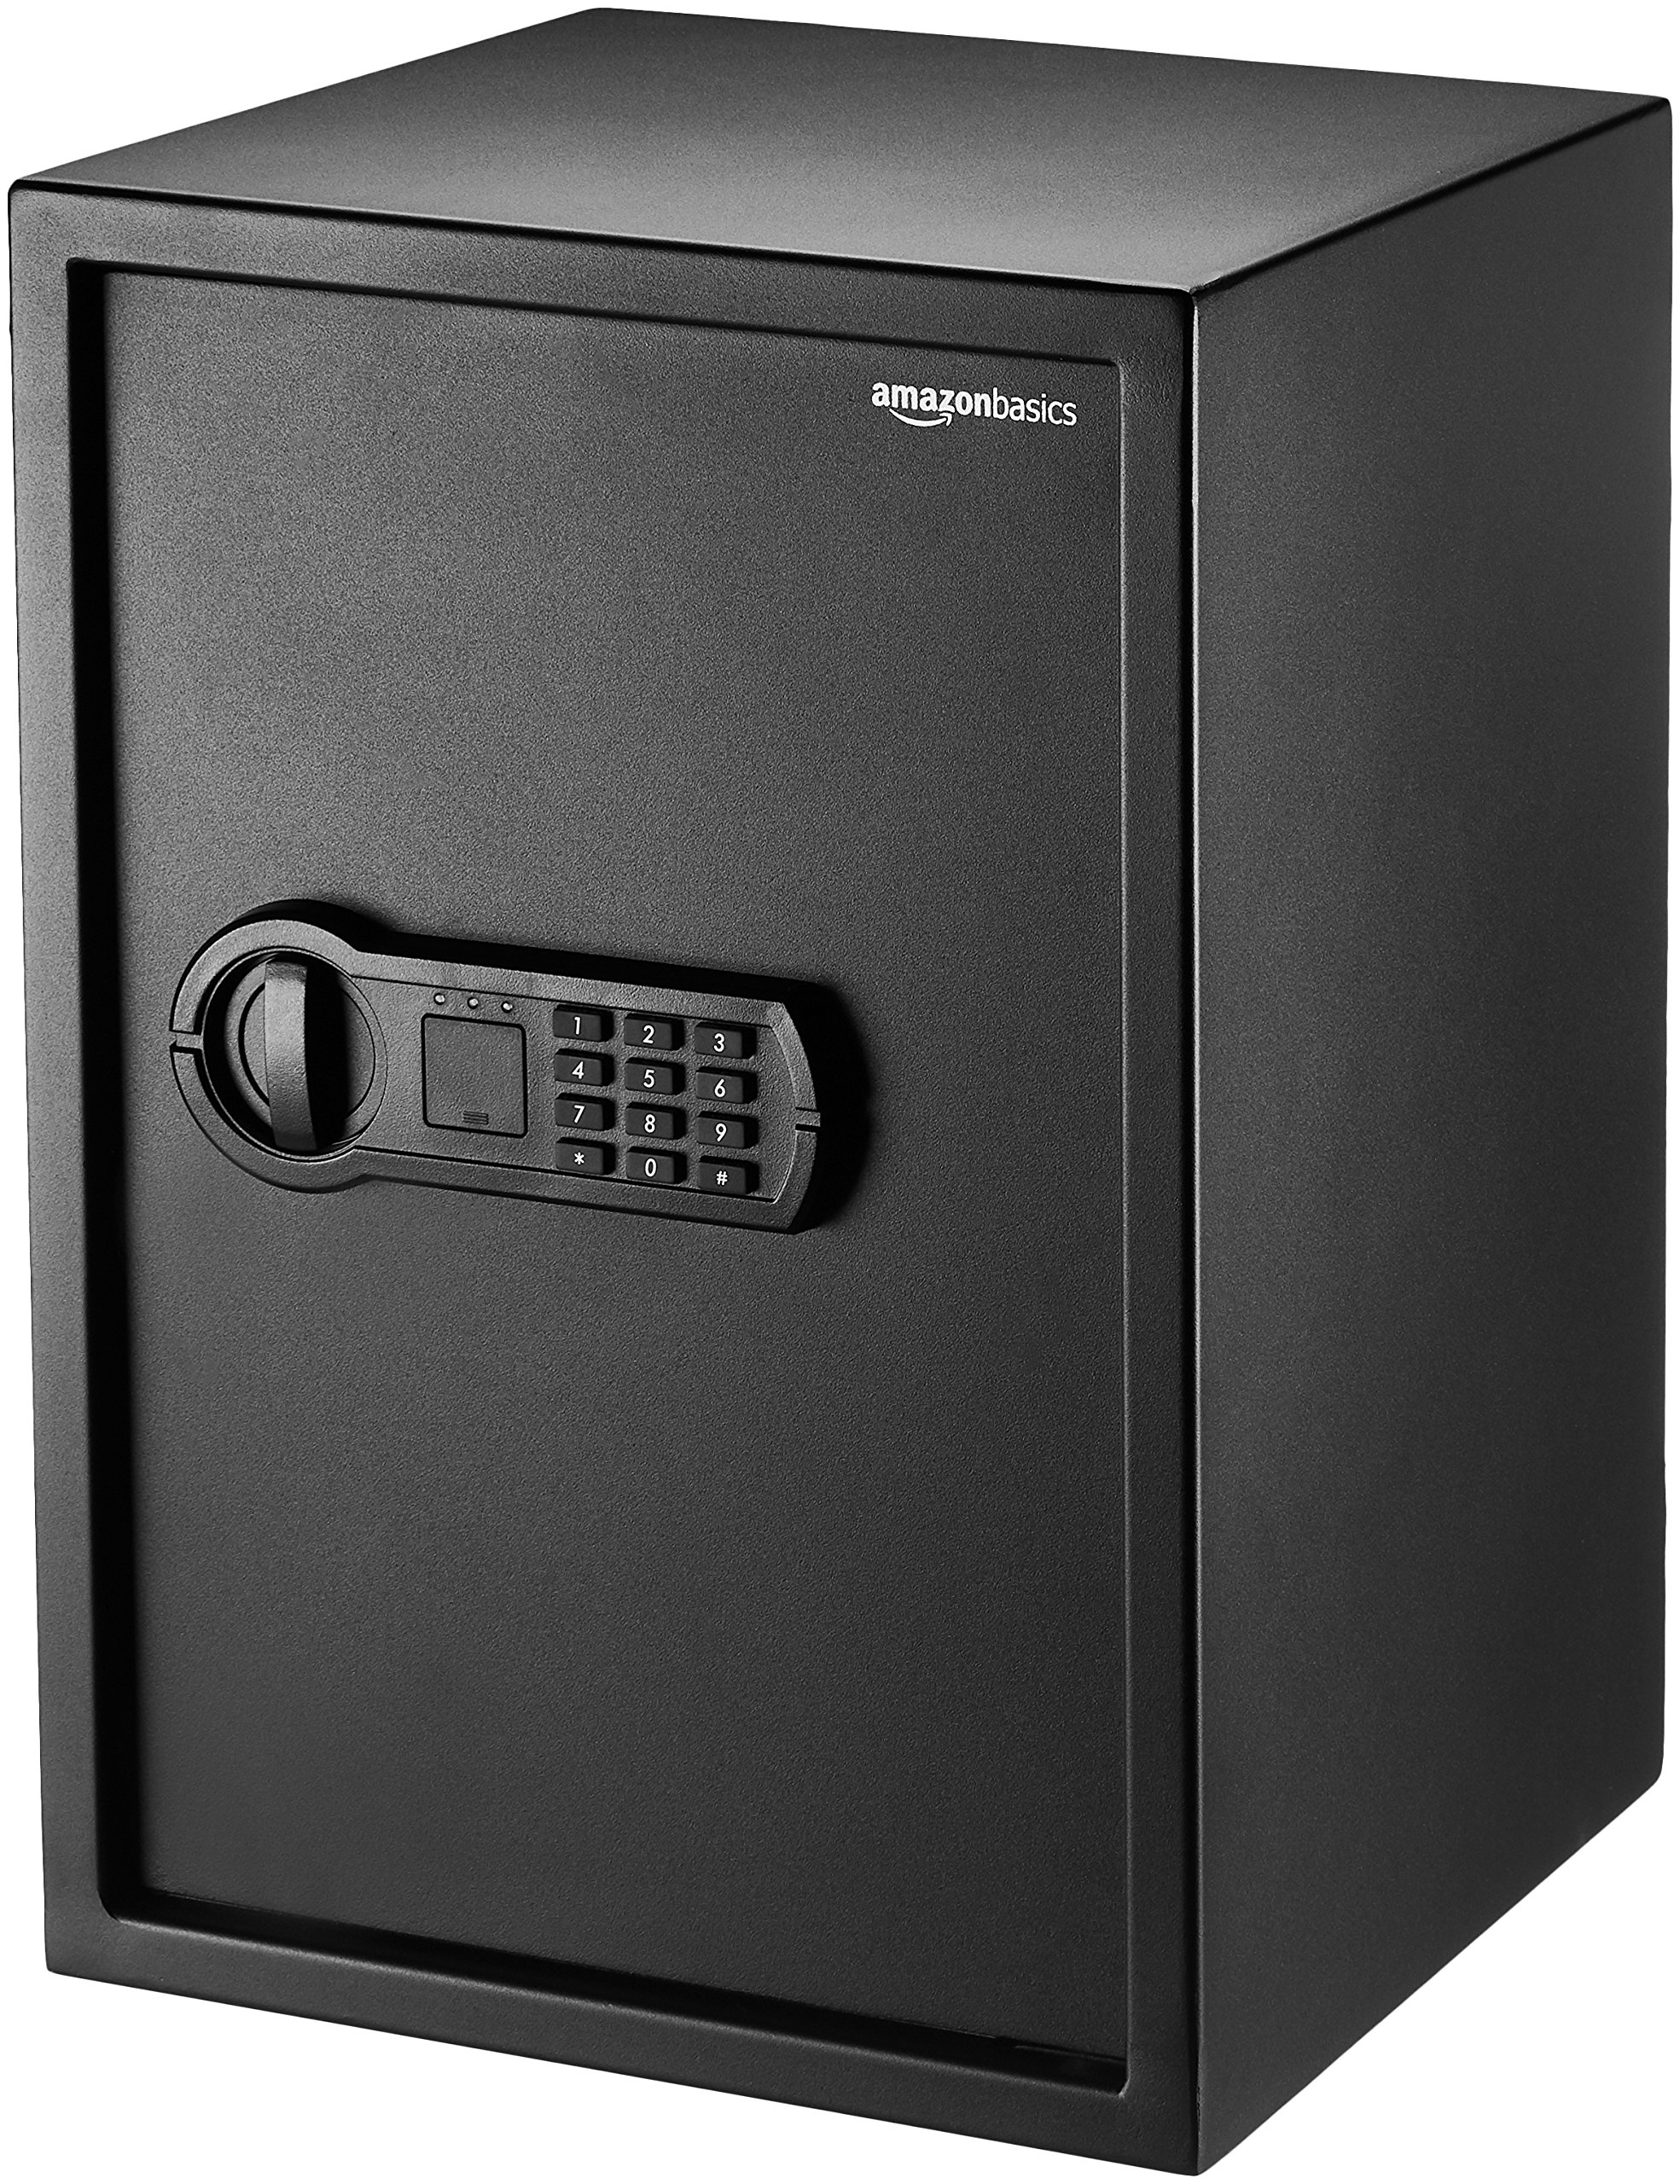 AmazonBasics Home Keypad Safe - 1.8 Cubic Feet, 13.8 x 13 x 19.7 Inches, Black by AmazonBasics